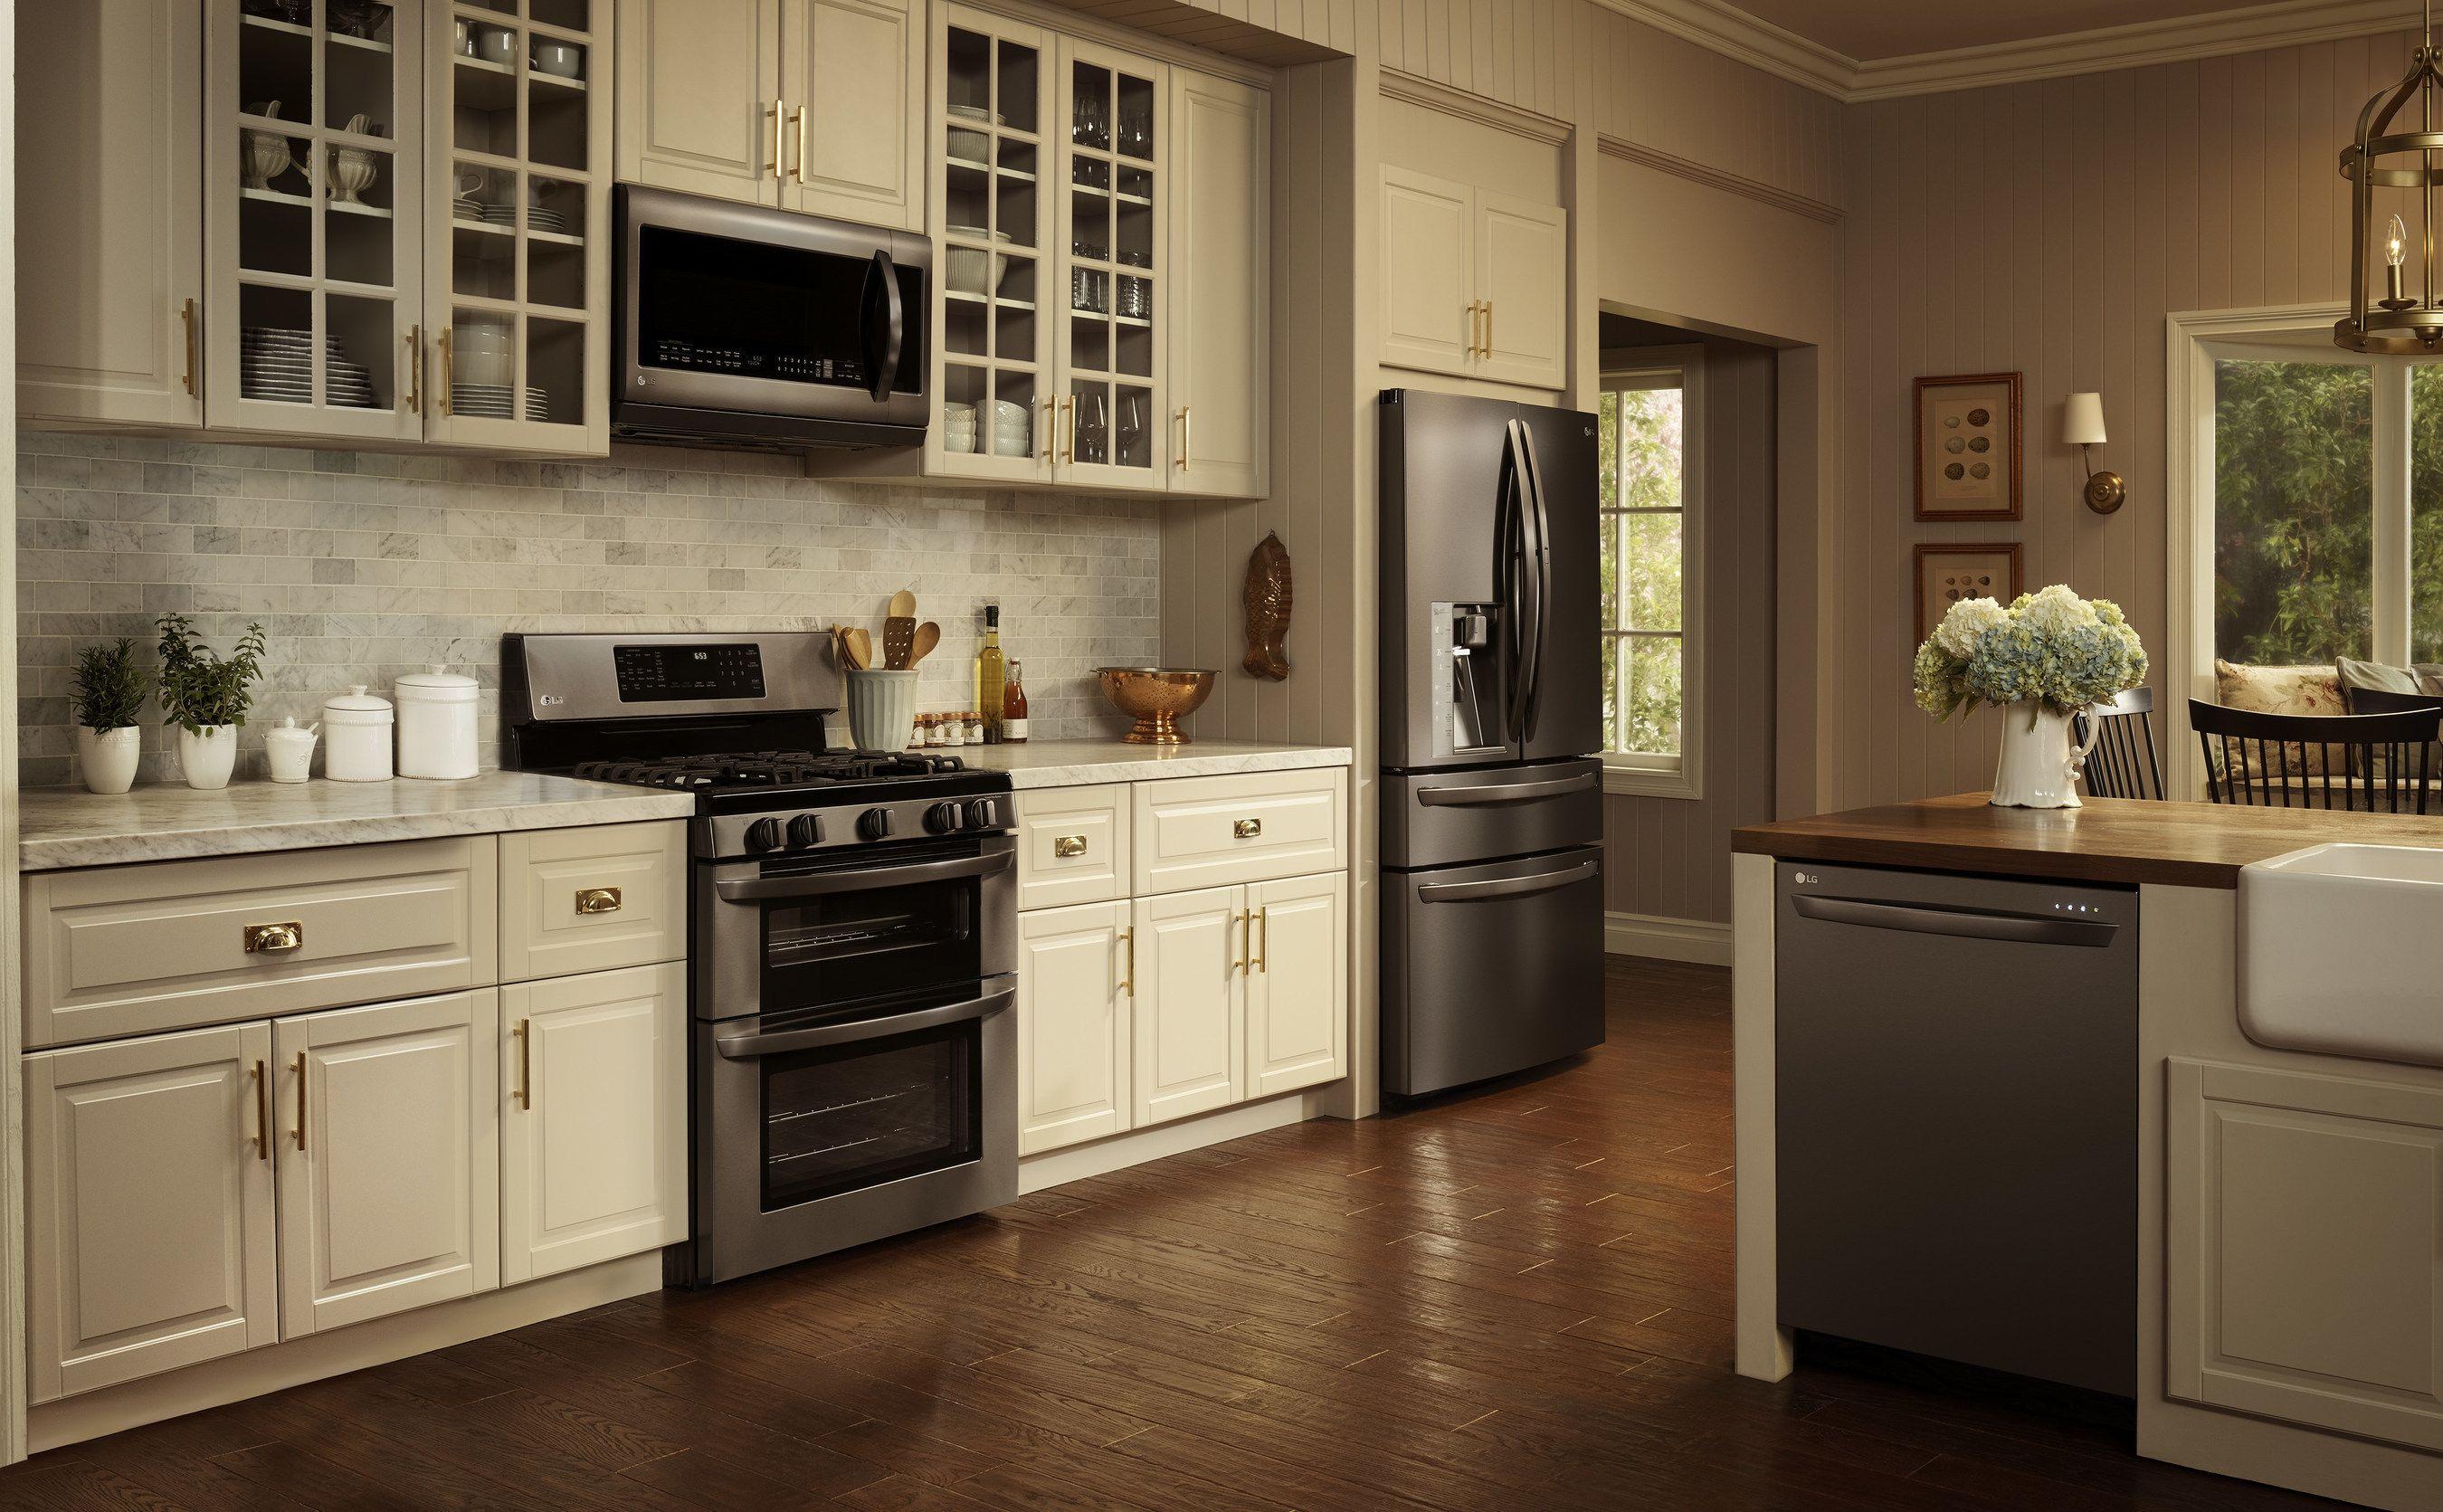 Englewood Cliffs N J Dec 10 2015 Prnewswire Lg Electronics Newest Kitchen Design Black Stainless Steel Appliances Stainless Steel Kitchen Appliances Kitchen appliances trends 2015